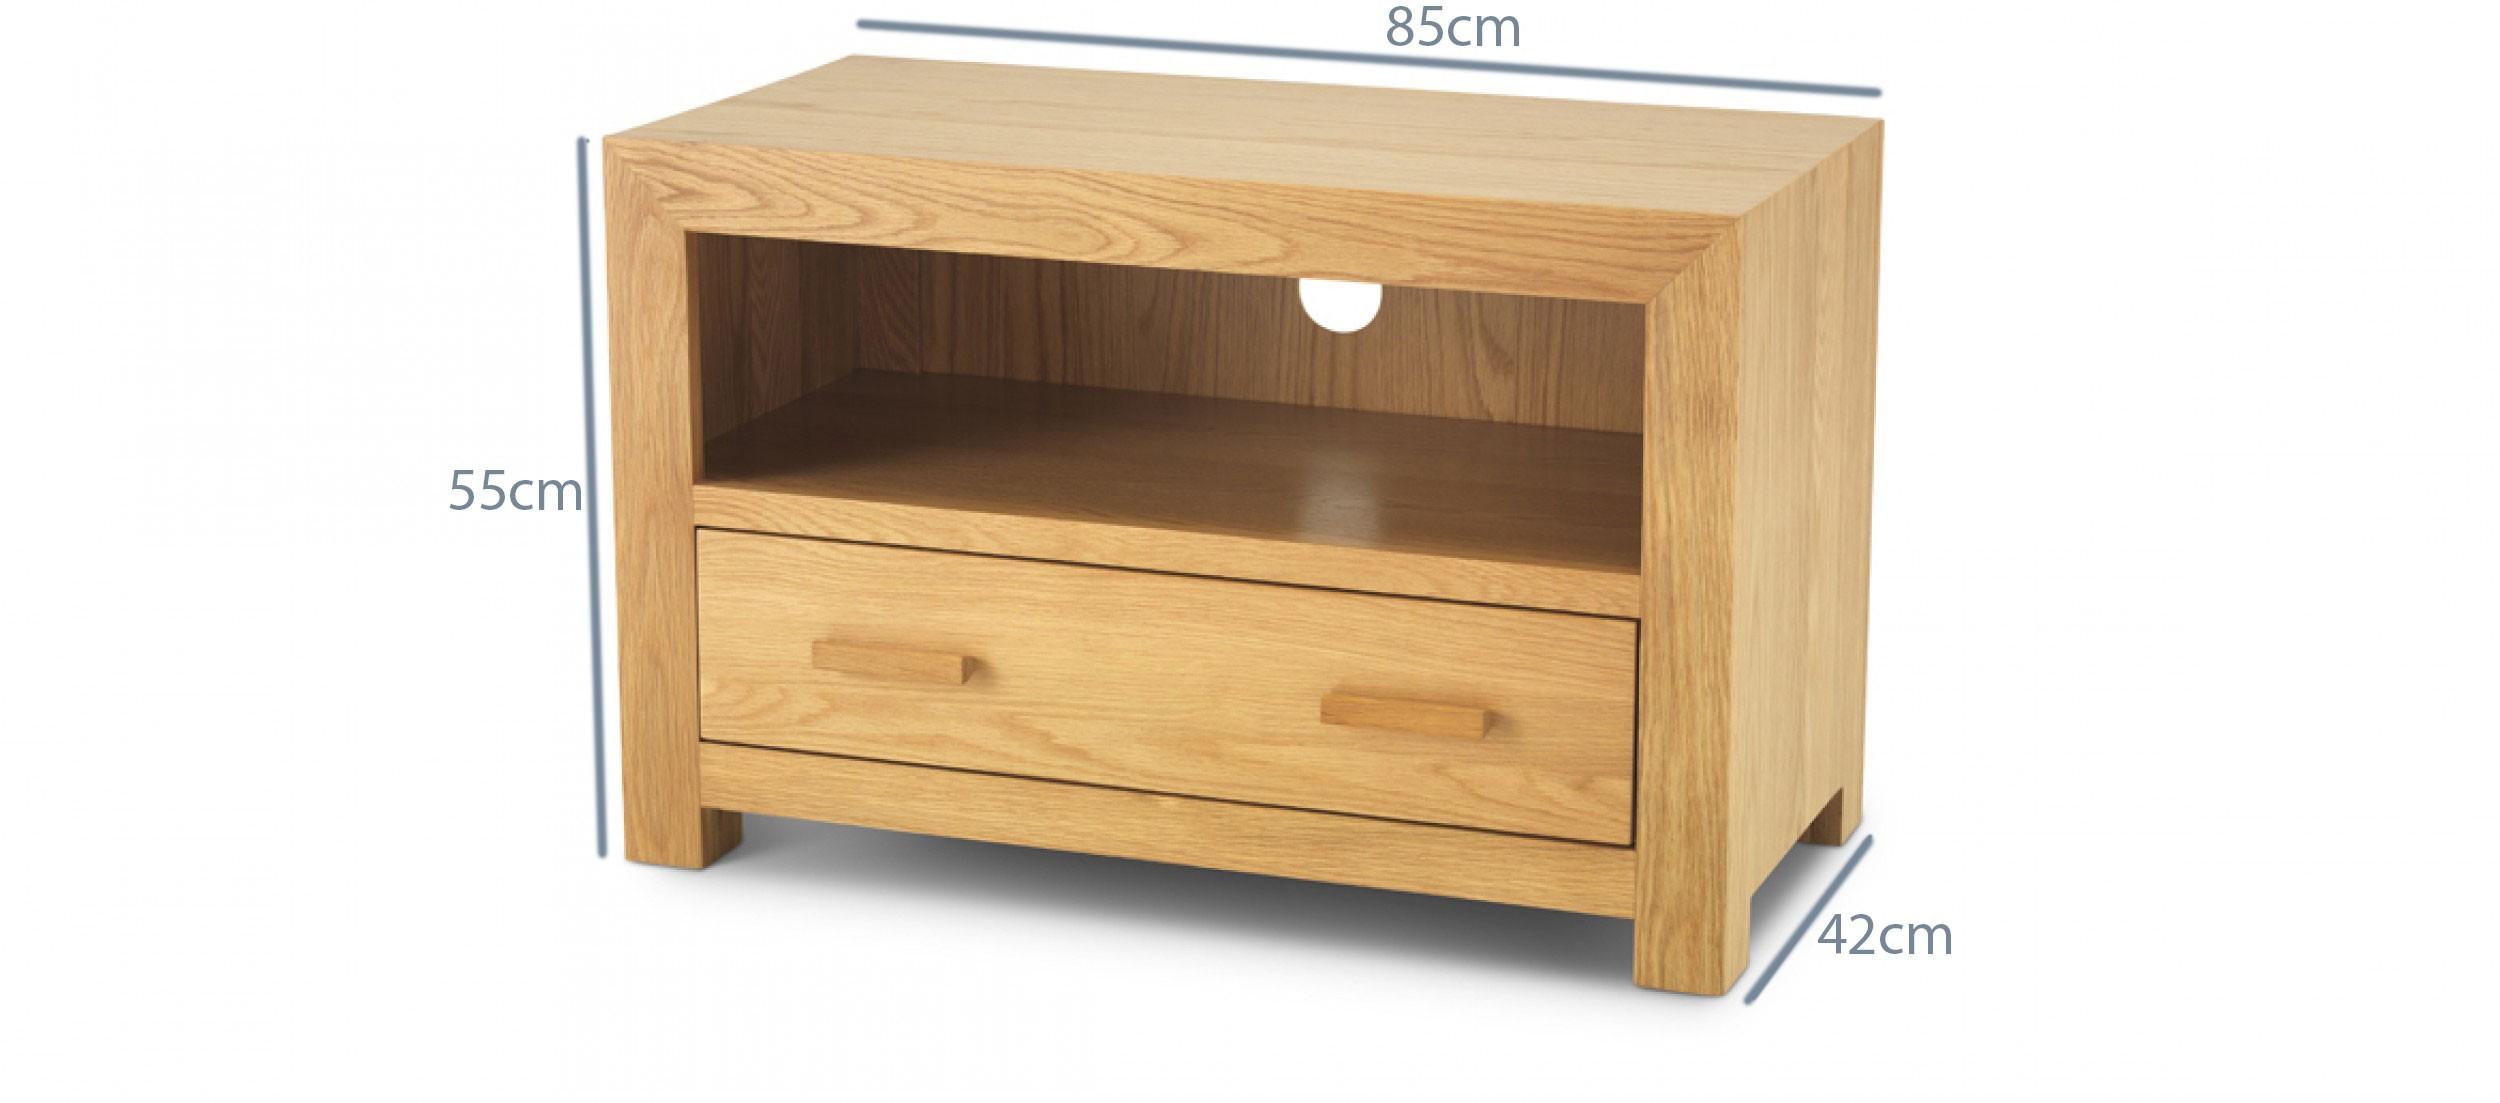 small tv units furniture. Cube Oak Small TV Unit Tv Units Furniture